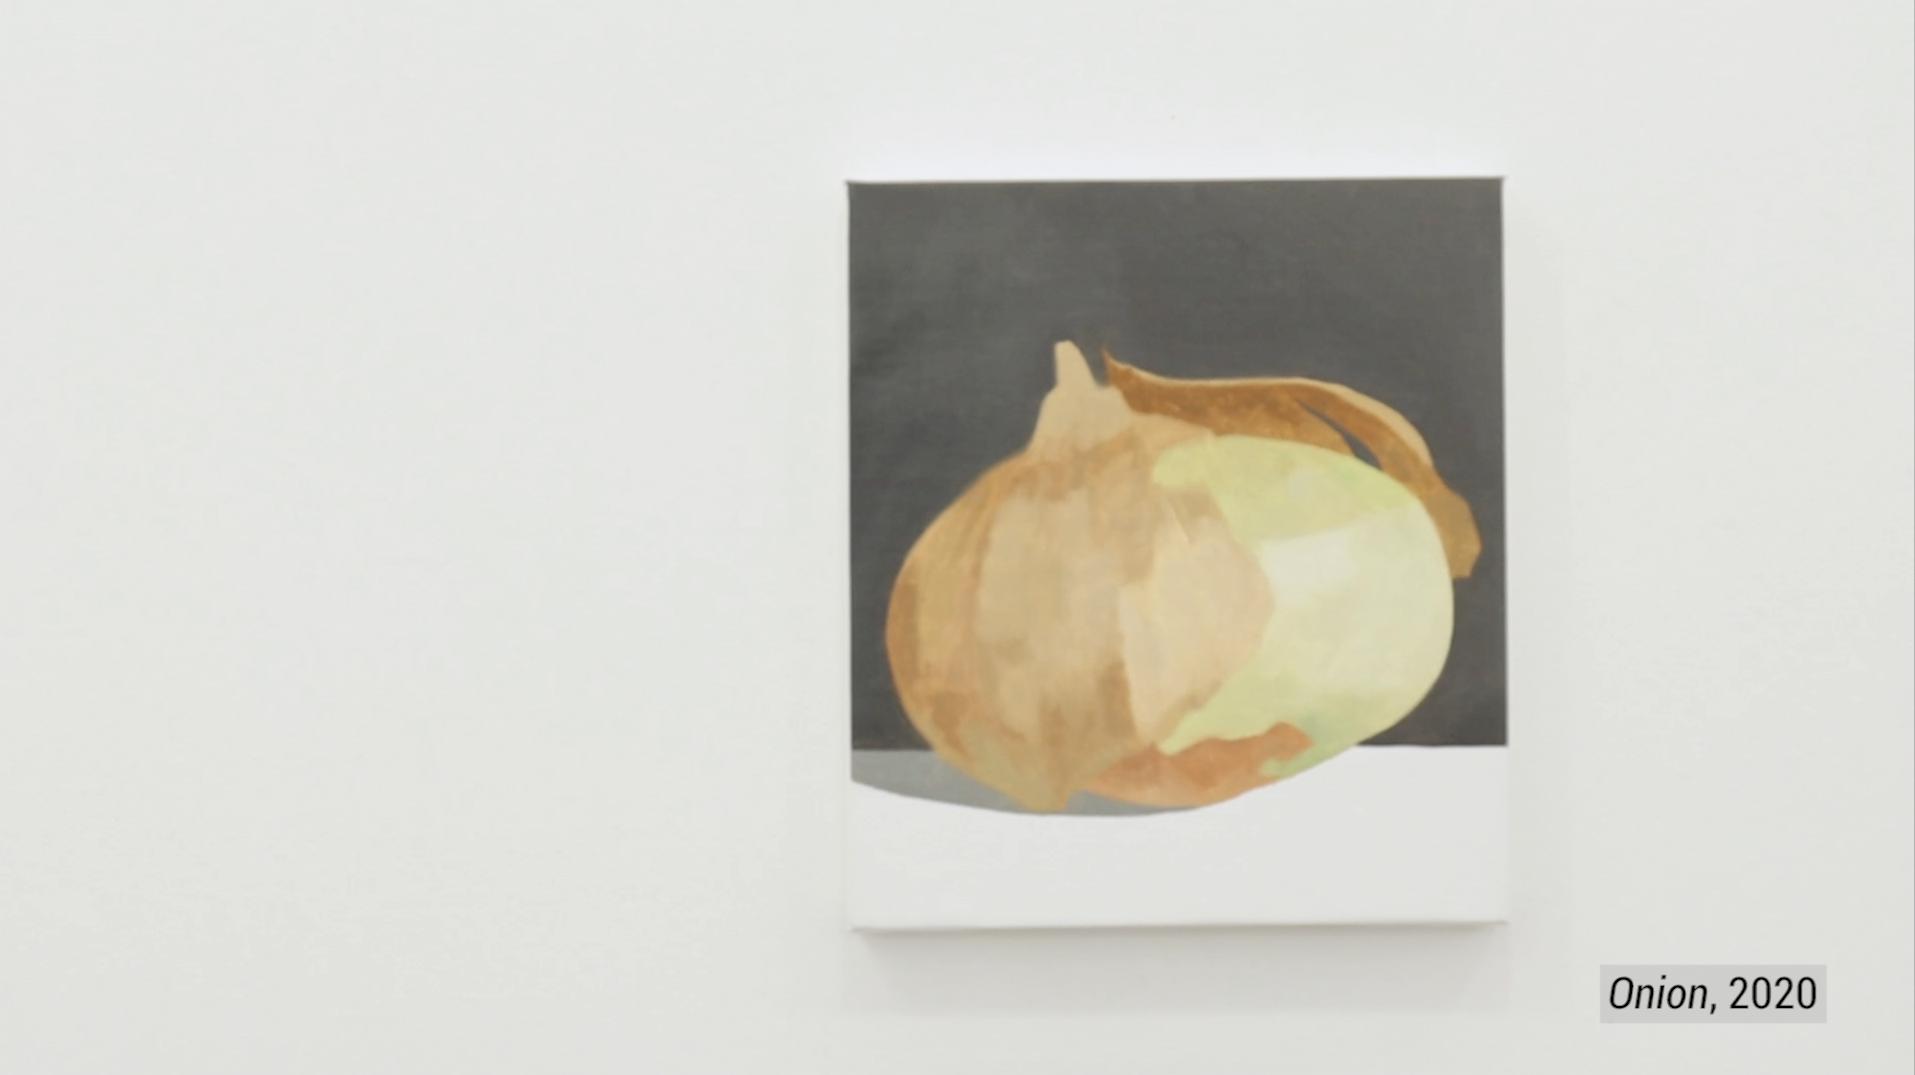 [RKP] Natagon Khamkayprong – Desolate Objects